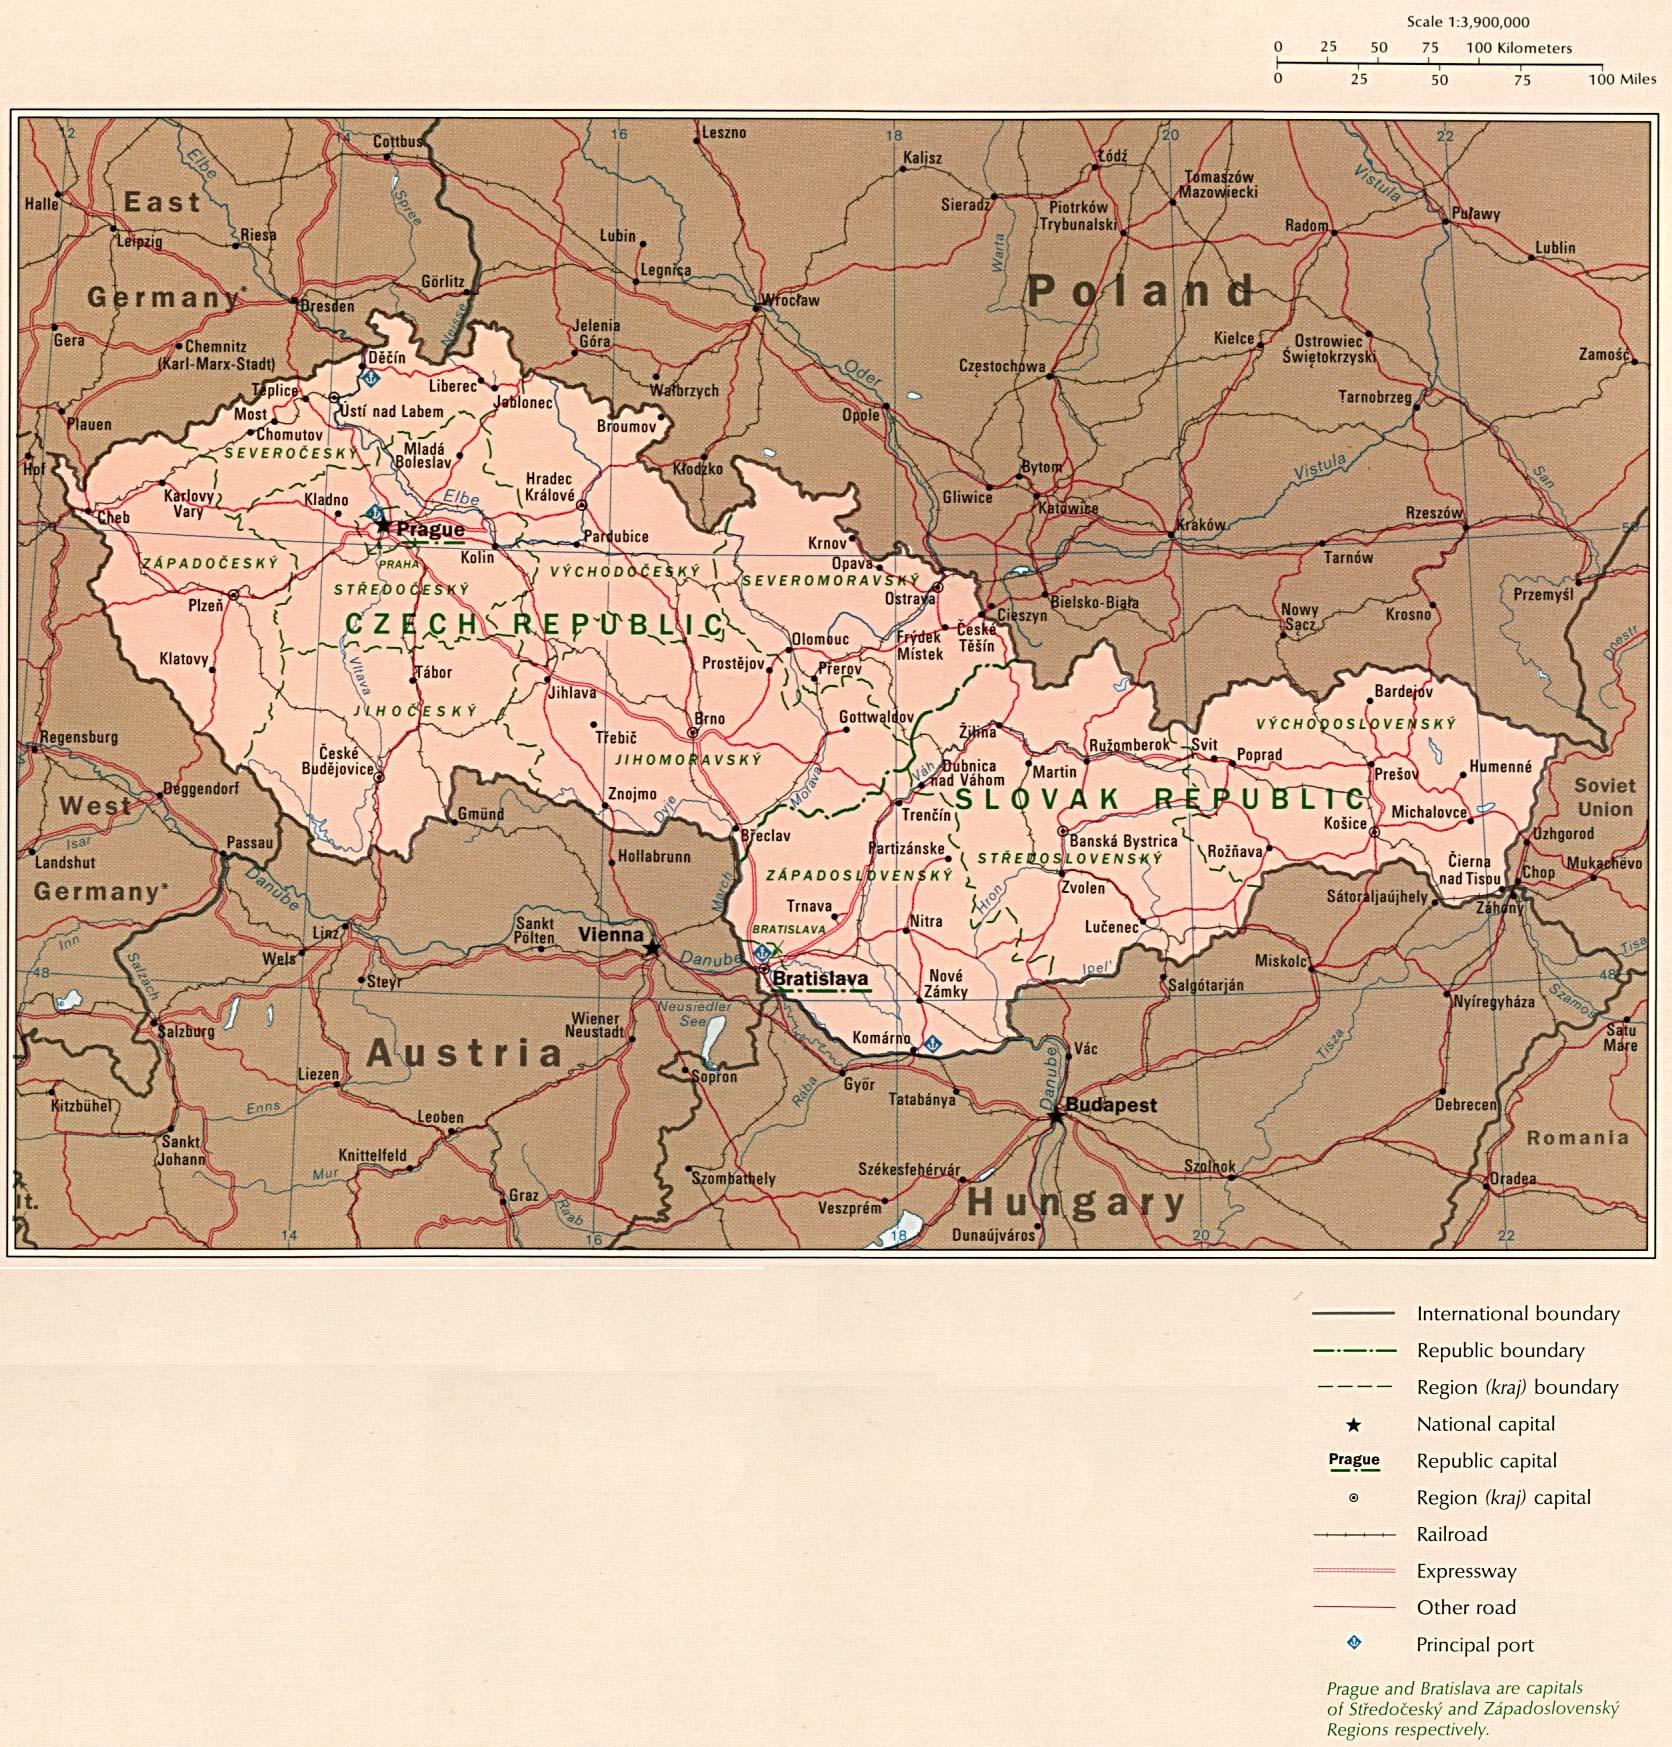 Atlas of Eastern Europe PerryCasta eda Map Collection UT – Europe Atlas Map